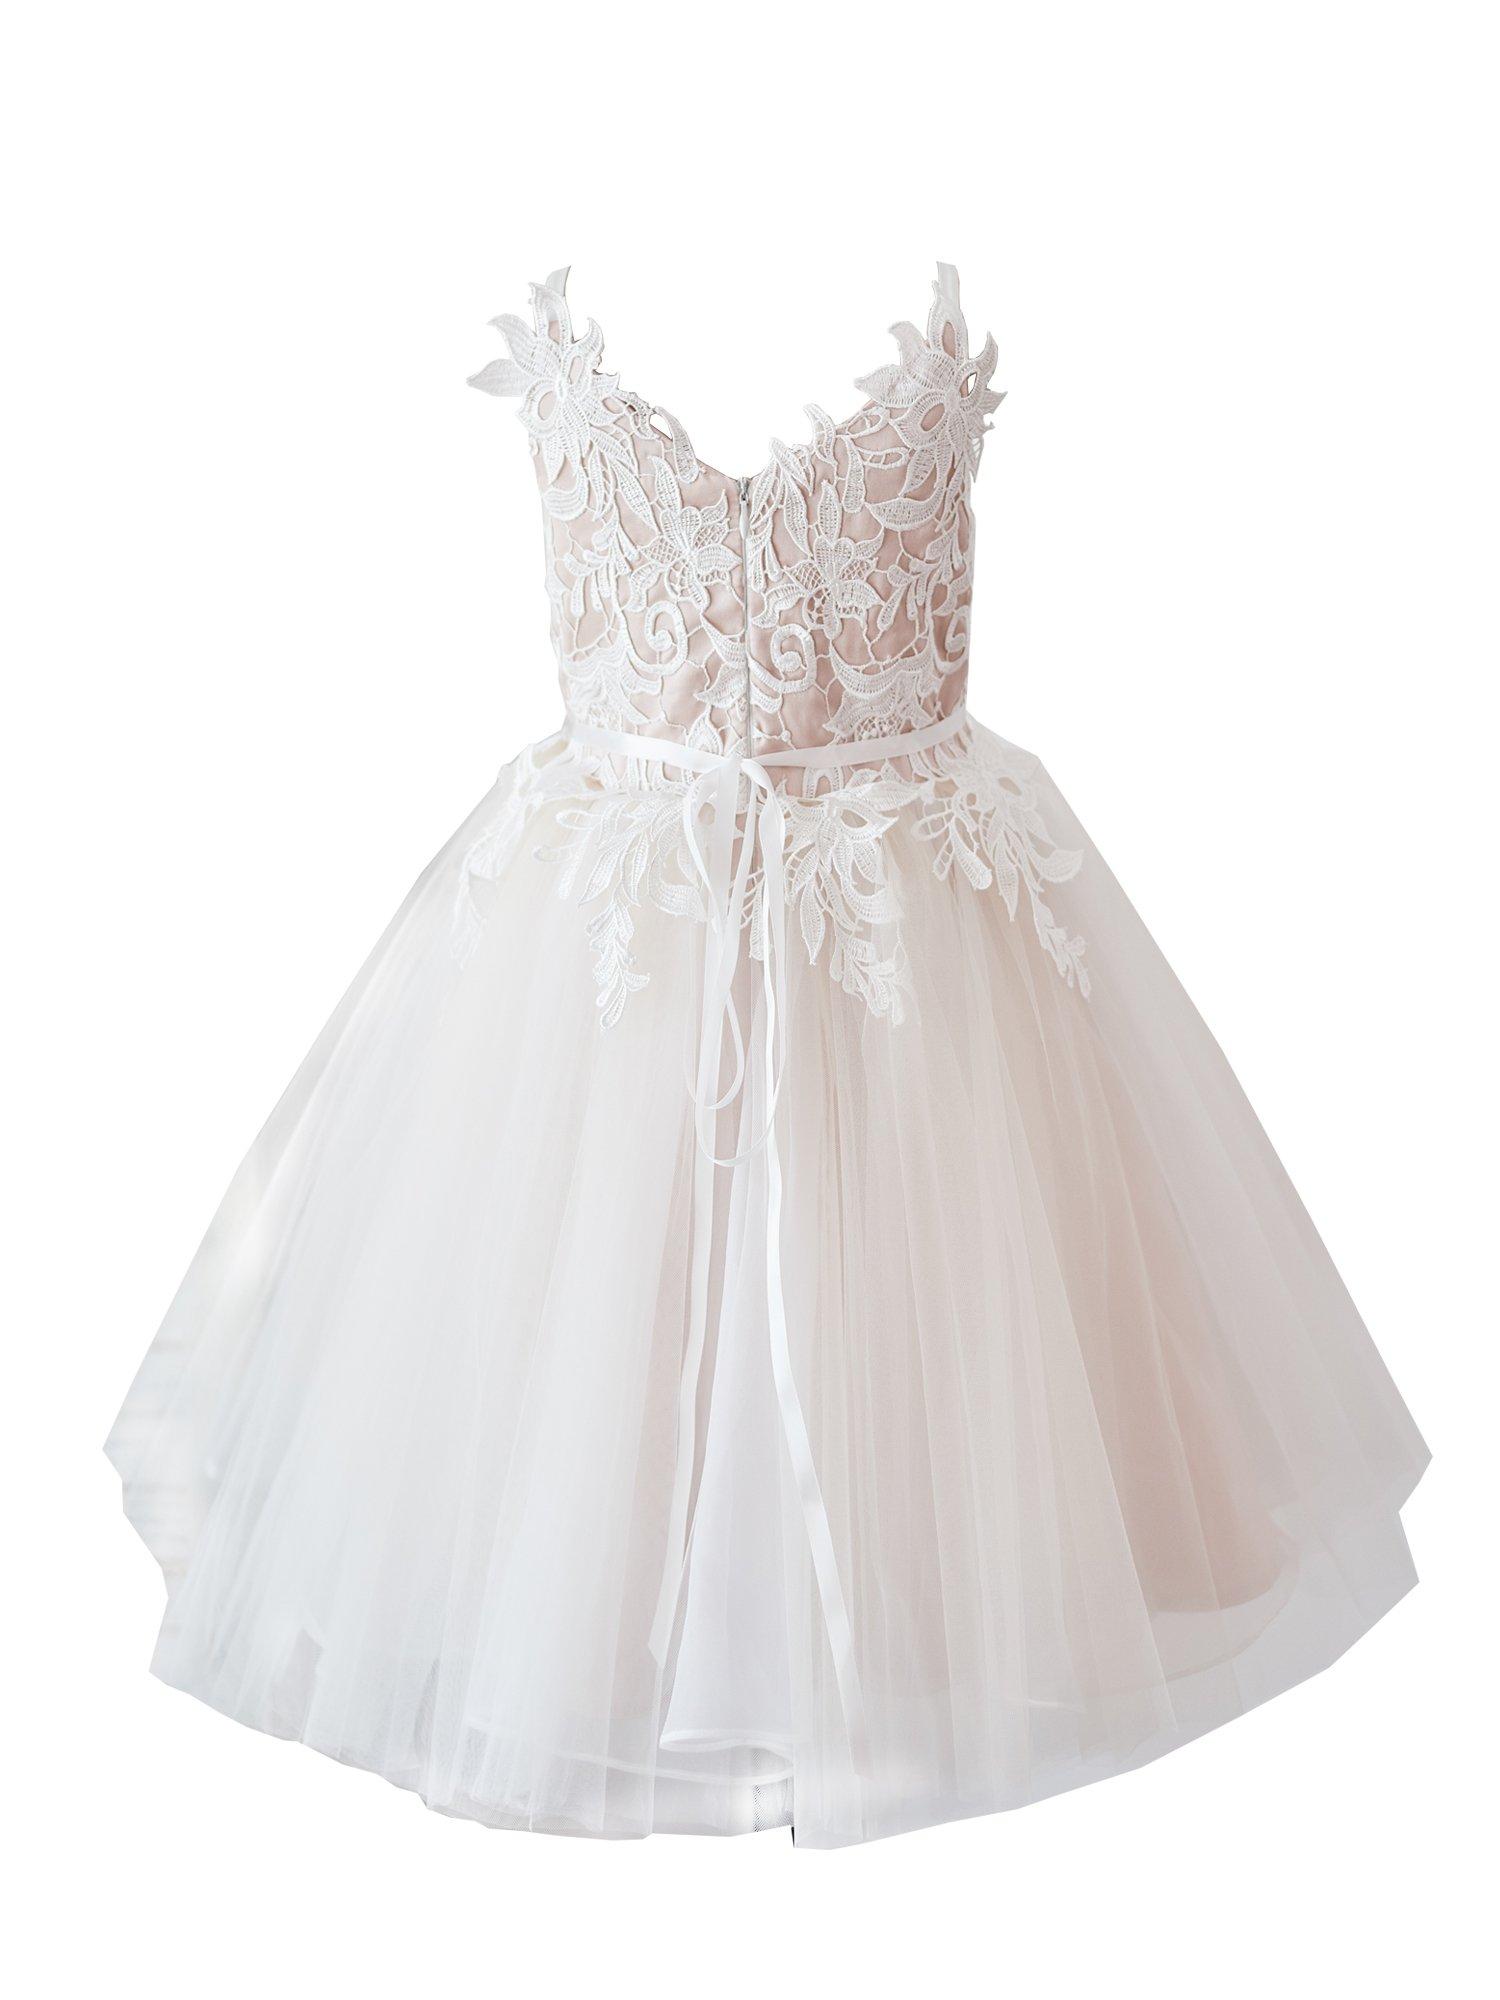 Miama Lace Tulle Straps Wedding Flower Girl Dress Junior Bridesmaid Dress